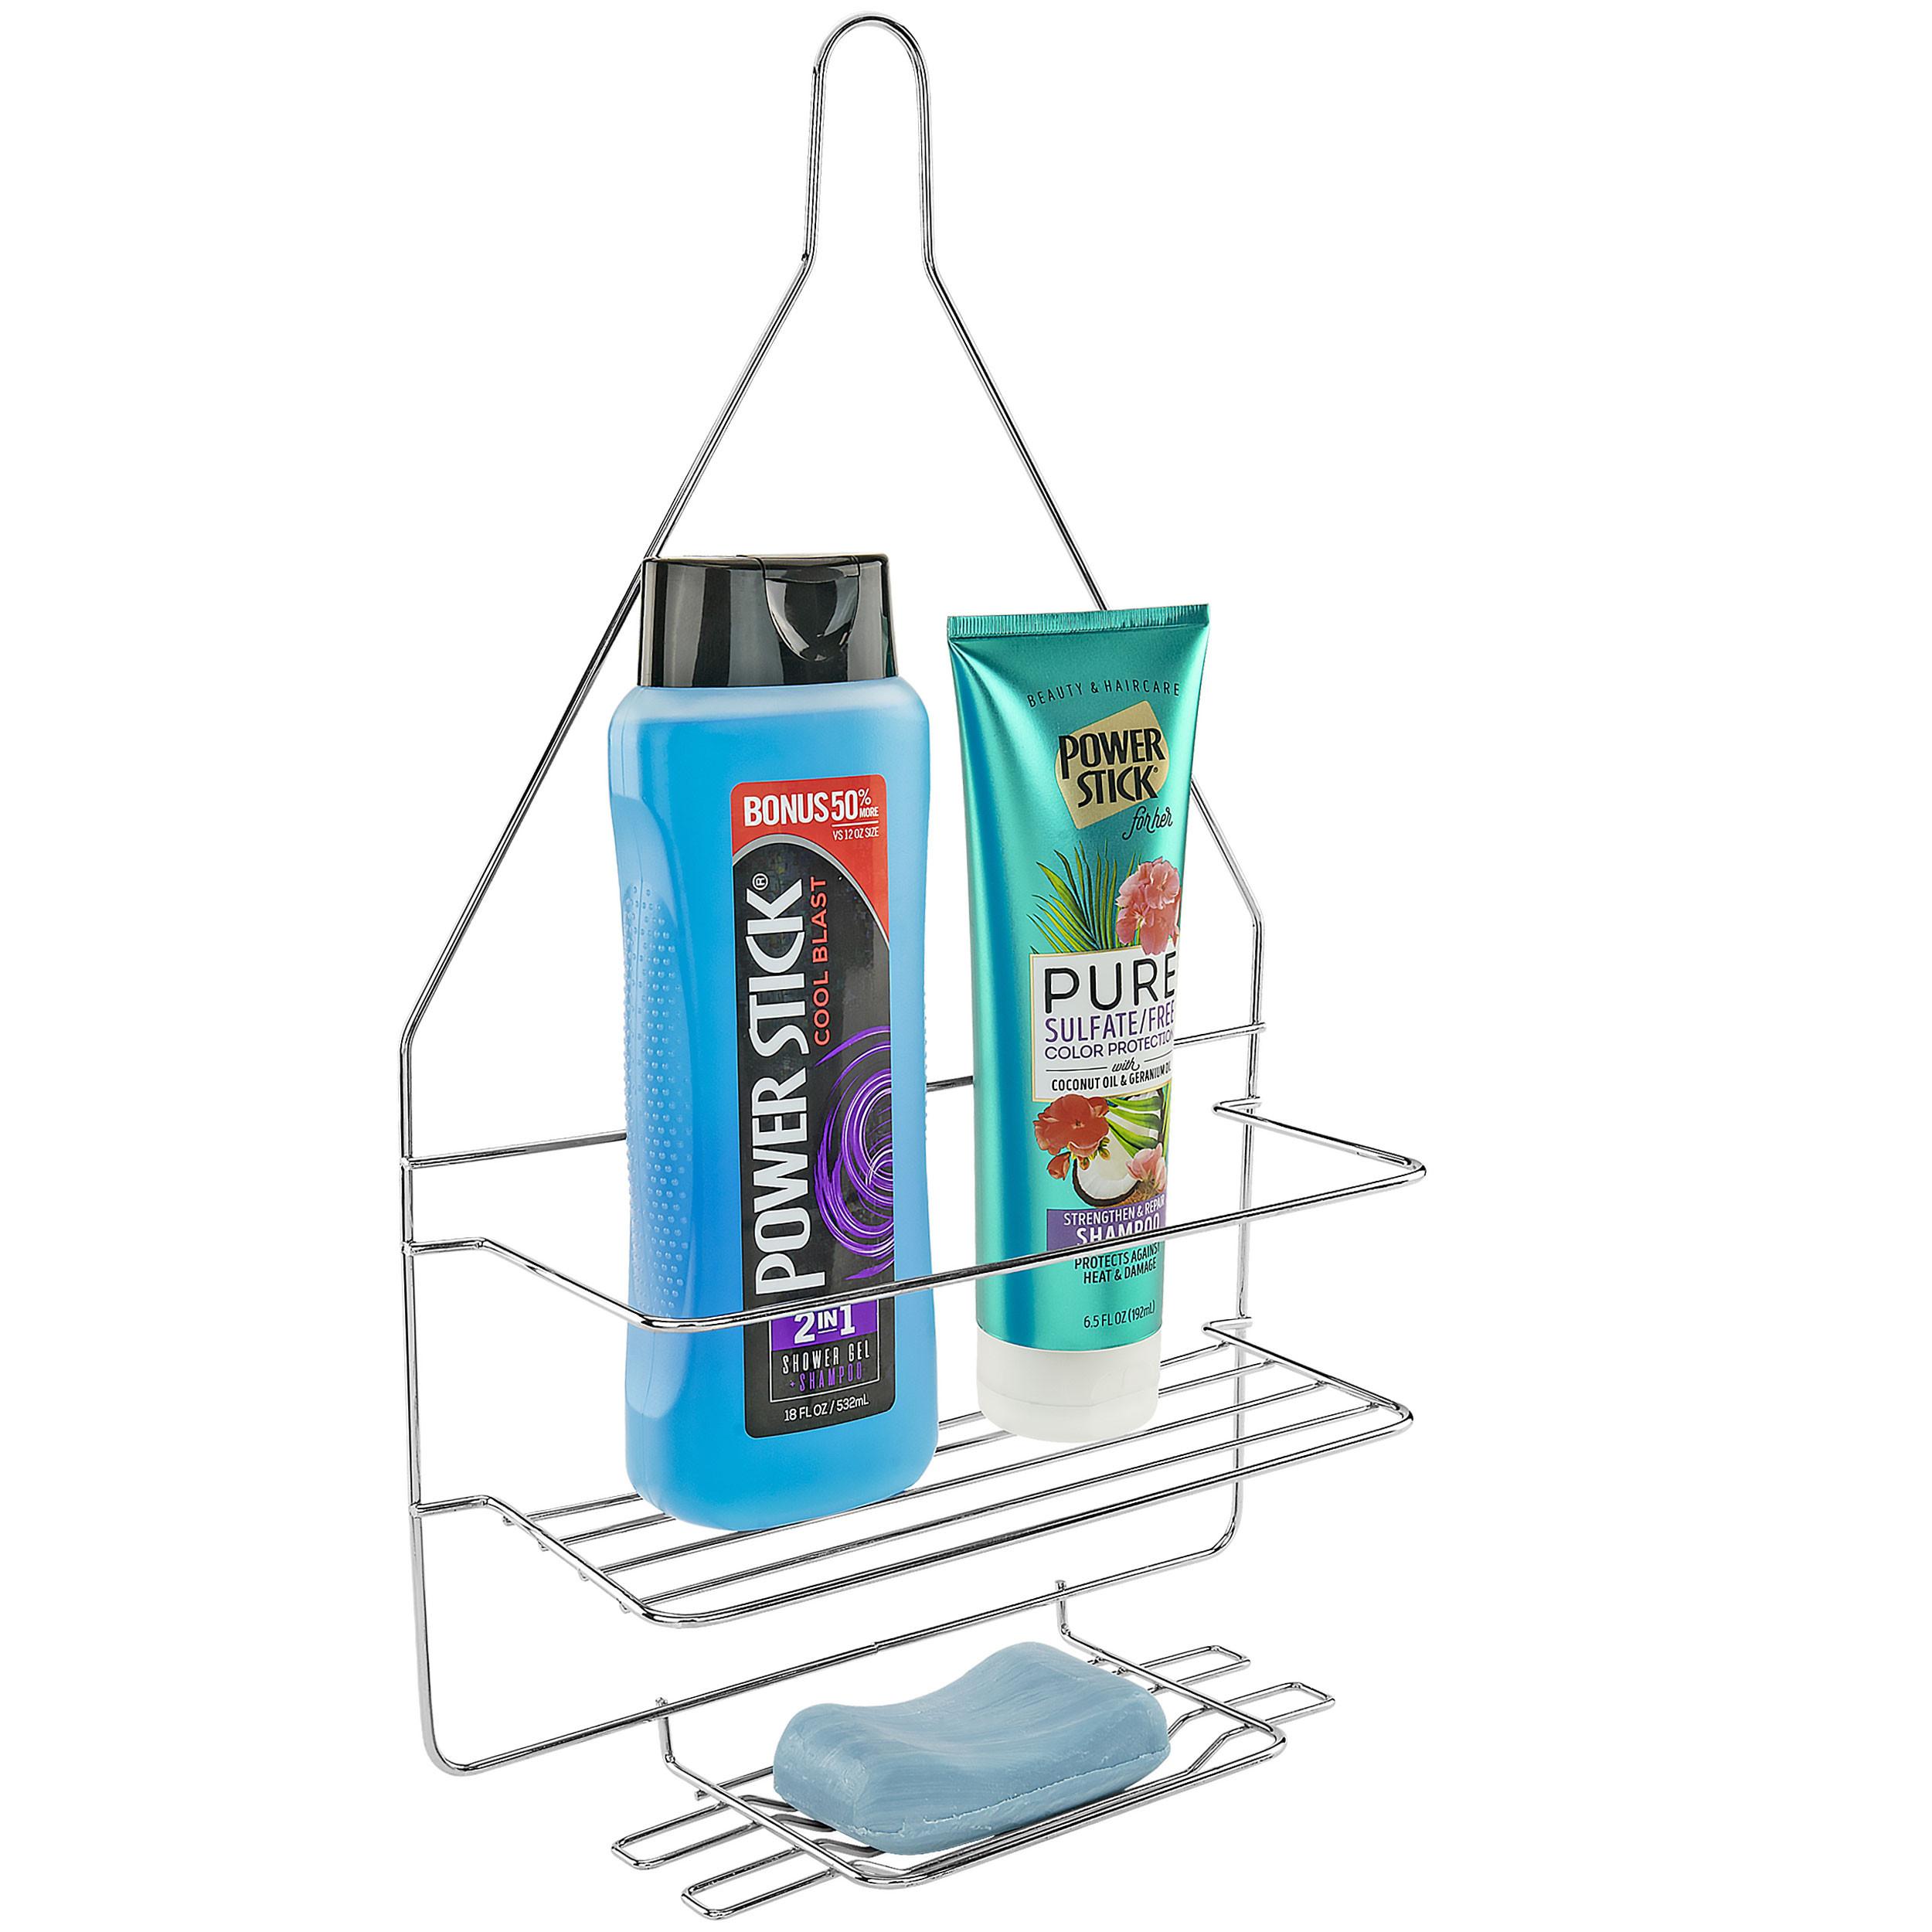 Southern Homewares Bathroom Over The Showerhead Shower Caddy for Shampoo, Conditioner, Soap - Chrome